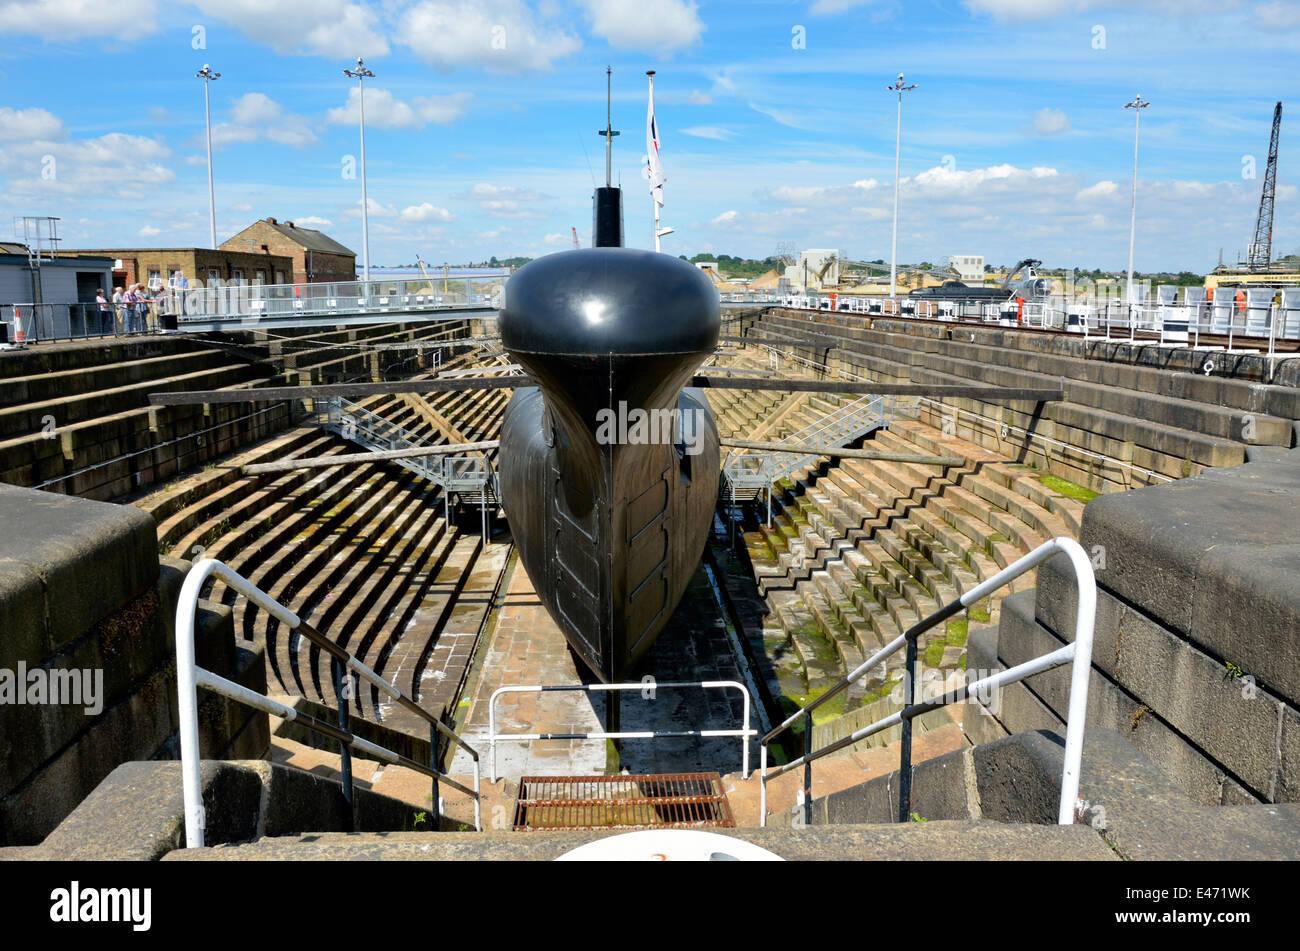 Chatham, Kent, England. Chatham Historic Dockyard. HM Submarine 'Ocelot'  'O' class diesel-electric - Stock Image